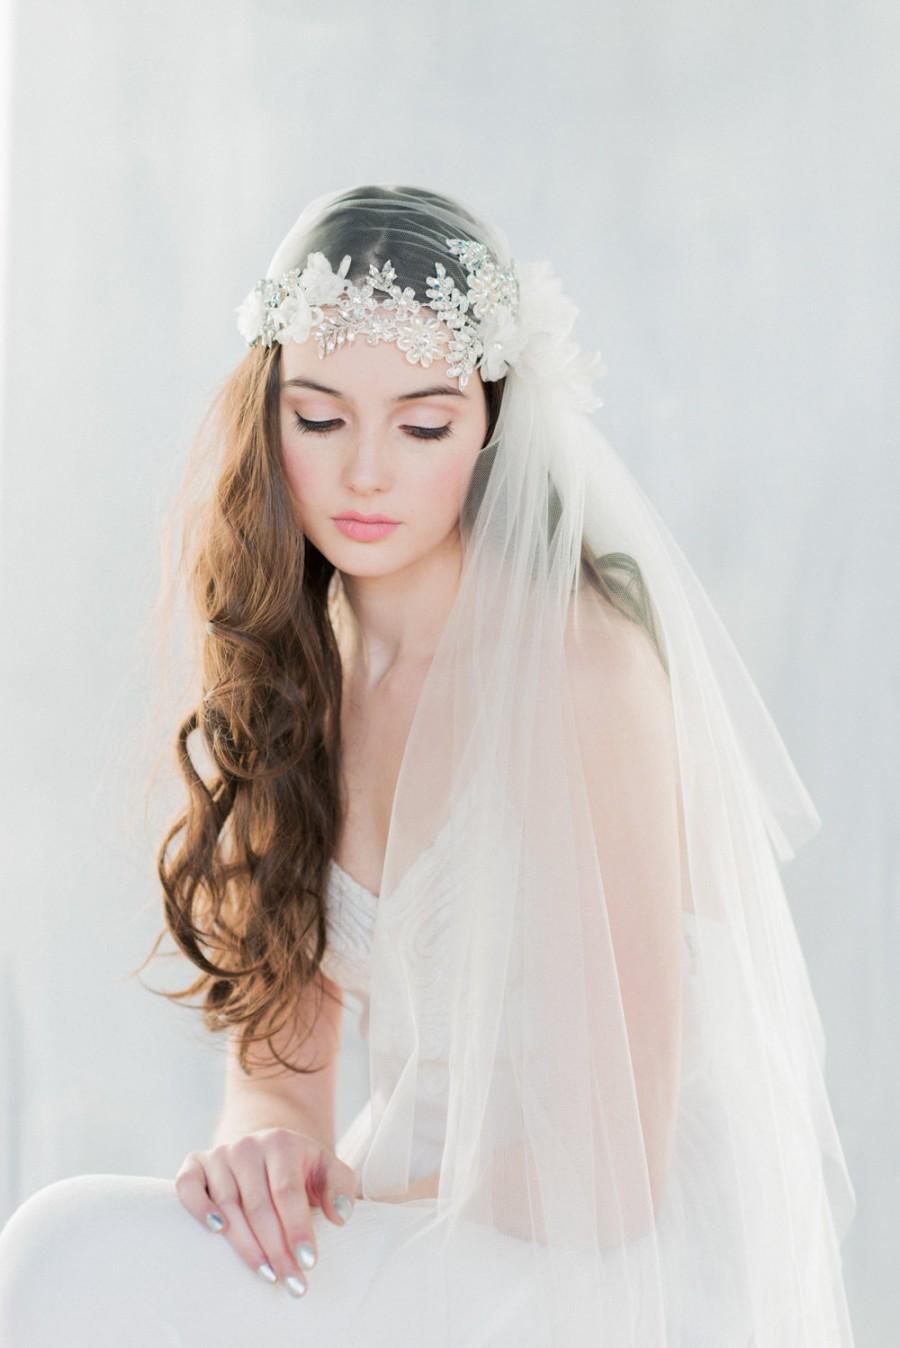 Mariage - Crystal Juliet Veil, Lace Juliet Veil, Crystal Veil, Flower Veil, Ivory Veil, Beaded Veil, Lace Veil, Lace Veil, Embroidered Veil ANTOINETTE